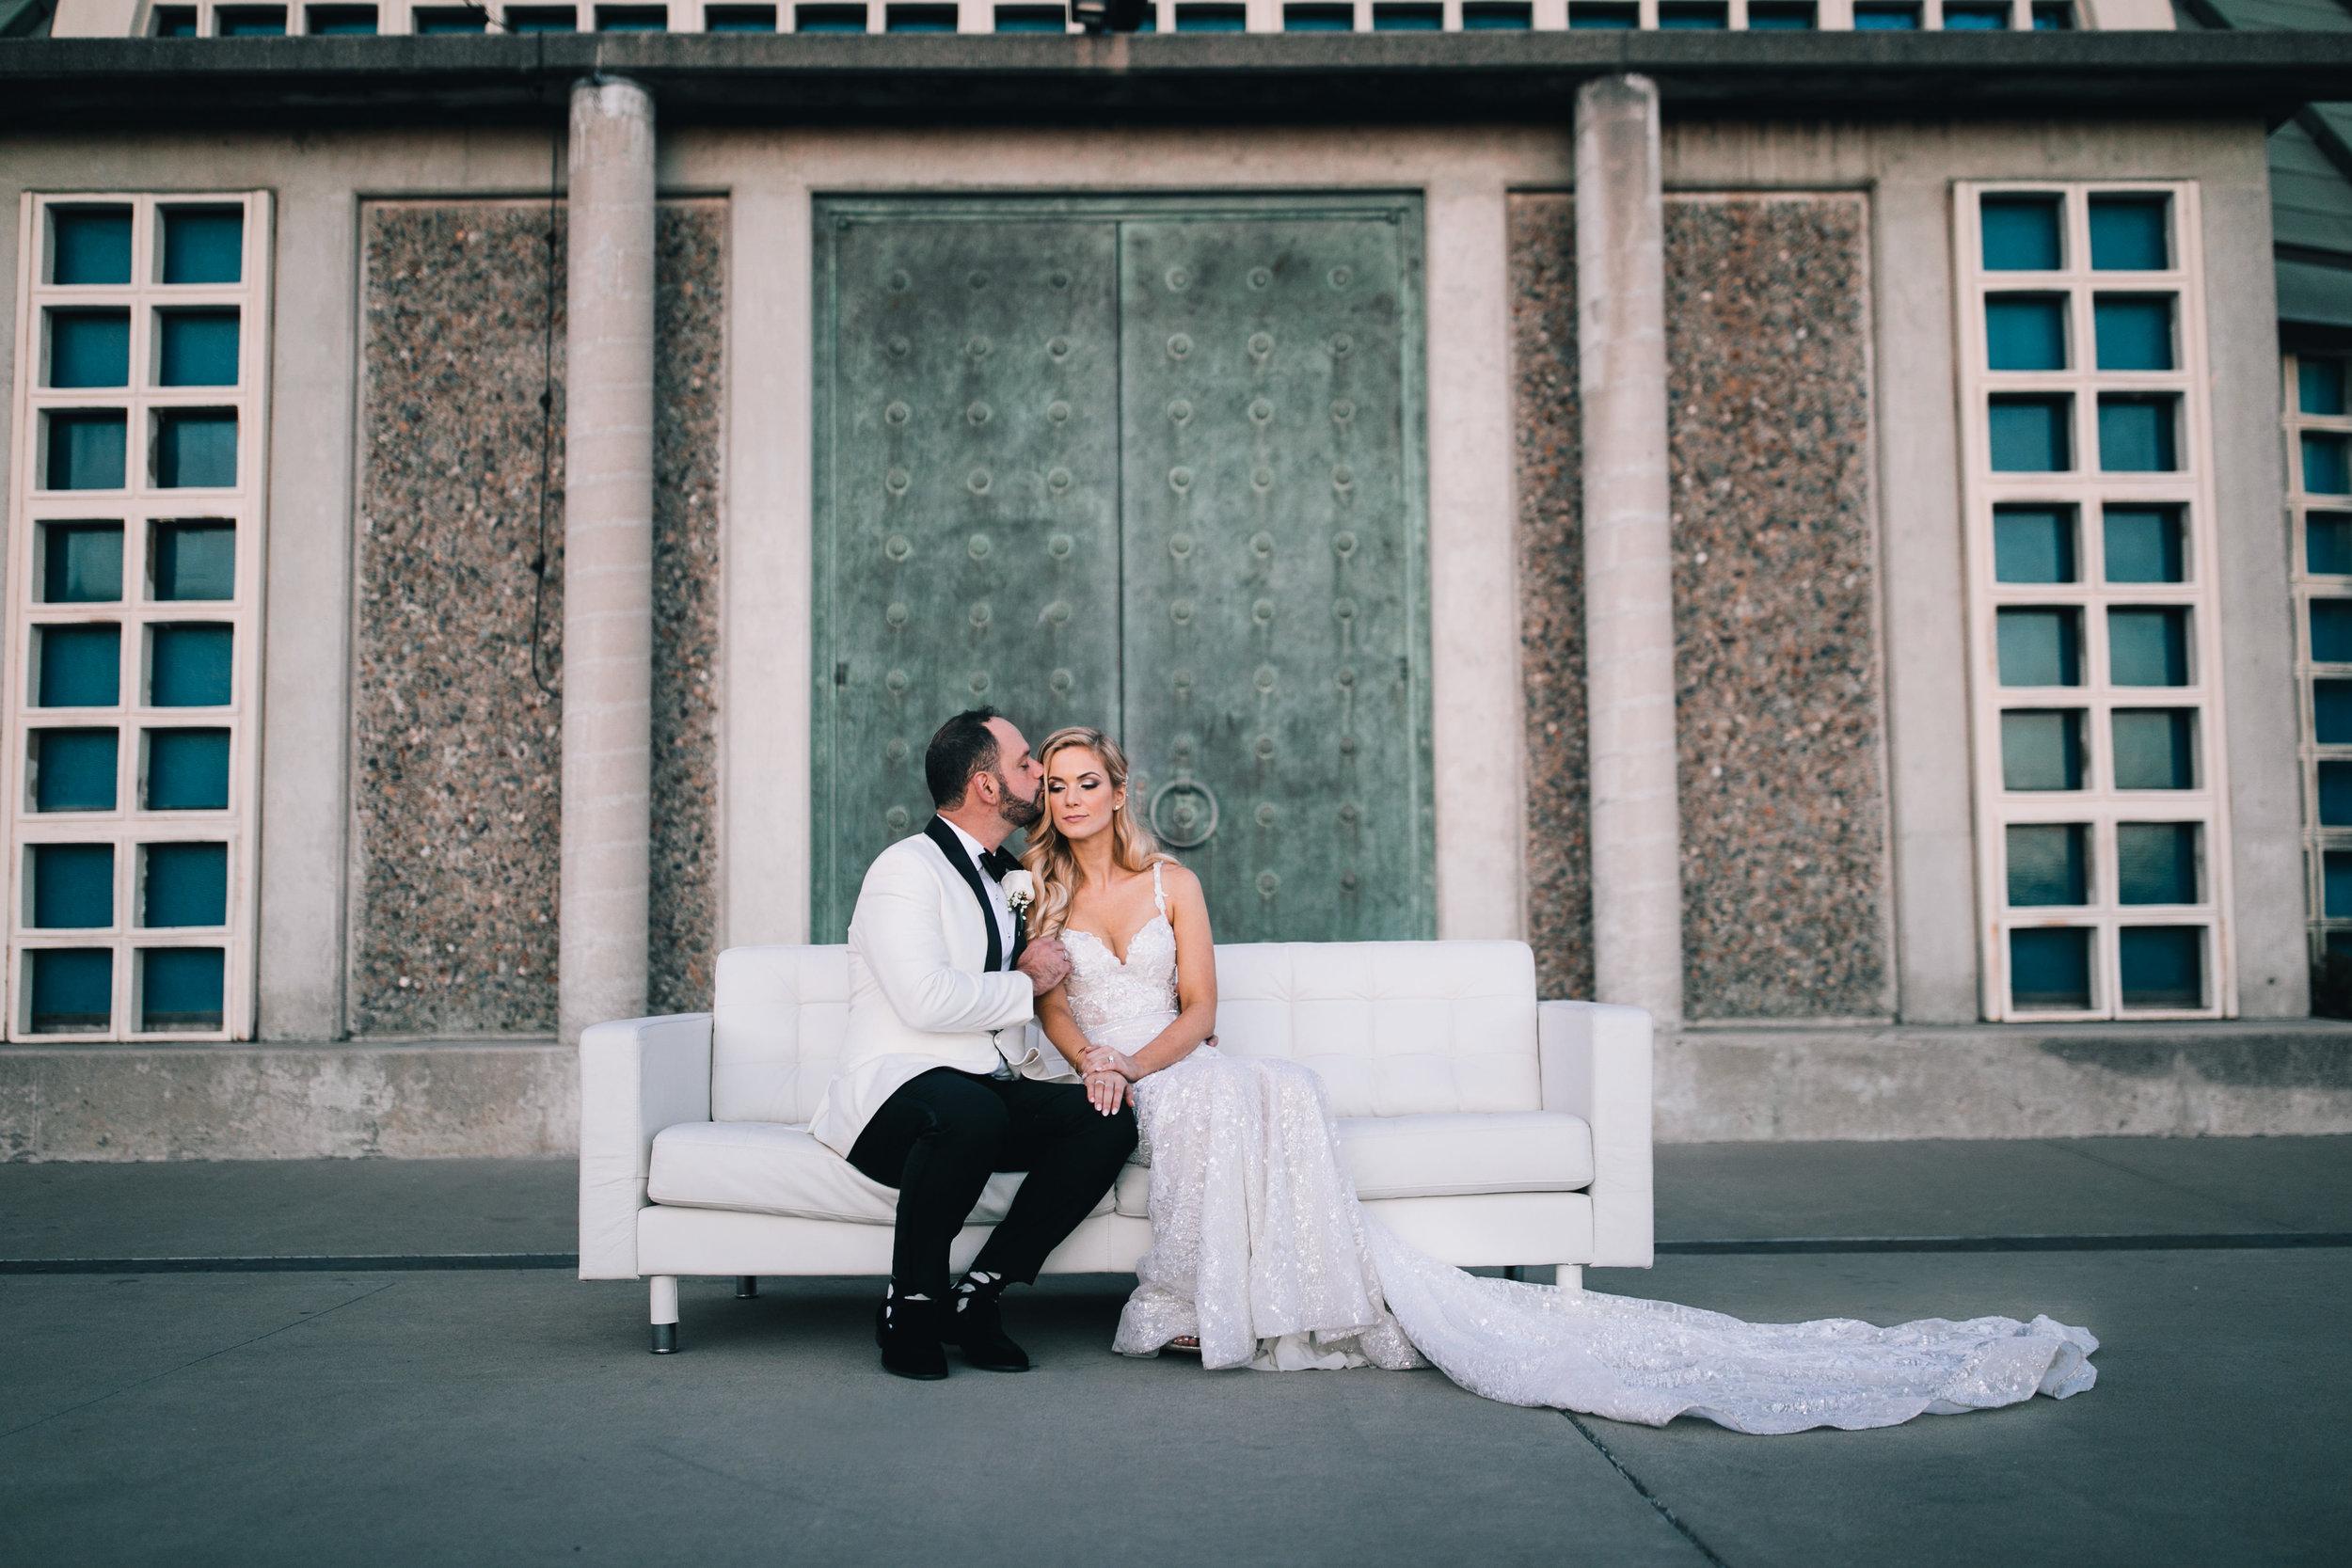 2018.09.08 Litsa and Sofo Greek Wedding Sneak Peak-24.jpg